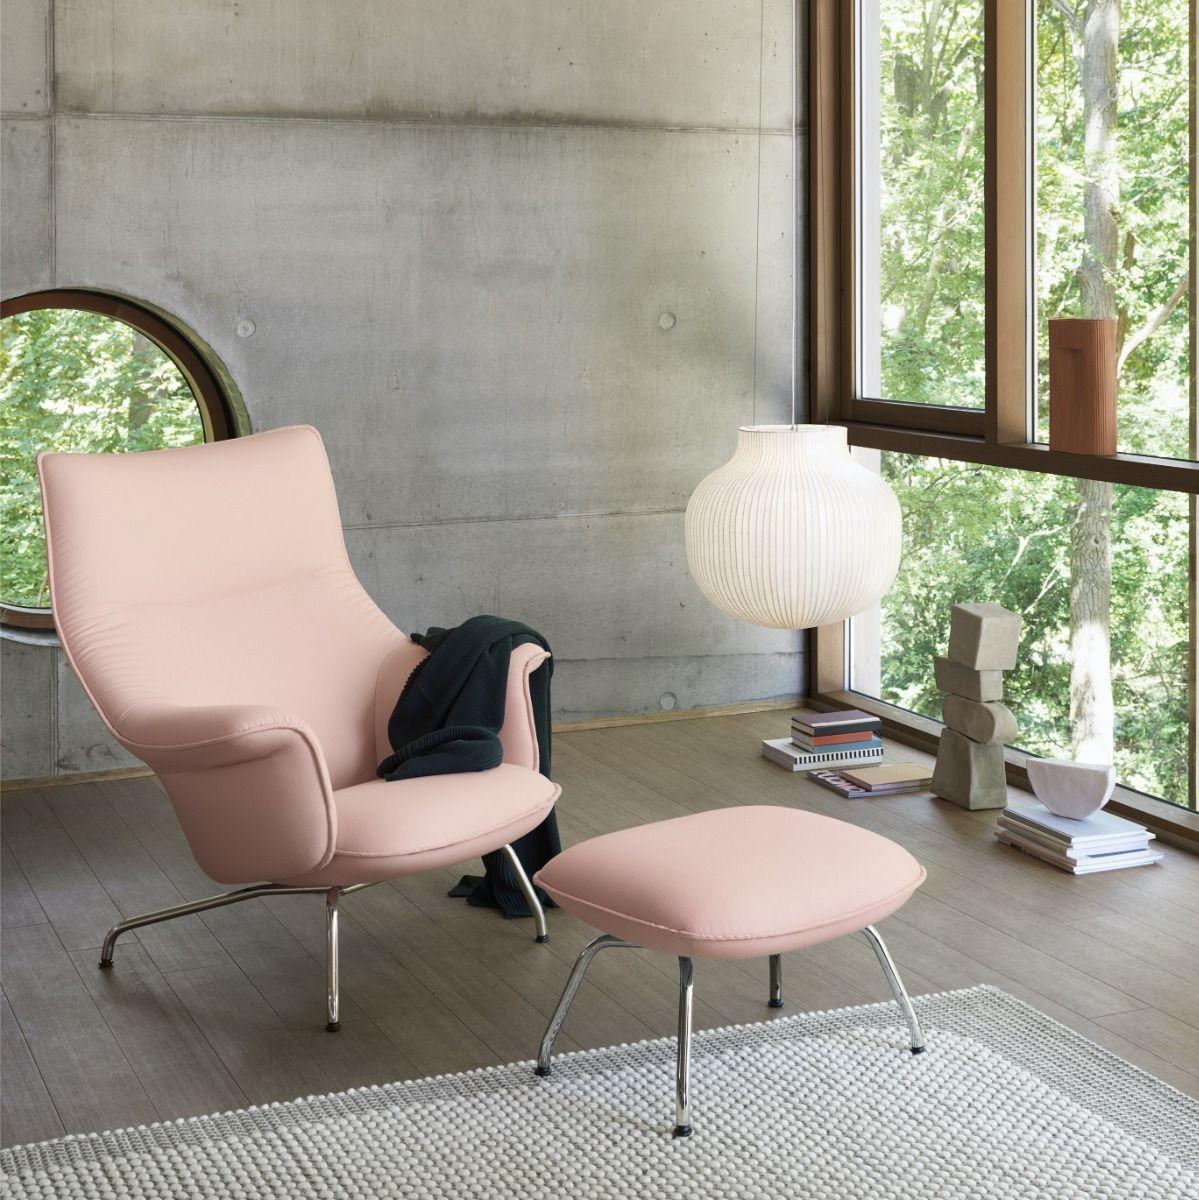 Muuto Doze Lounge chair in pink